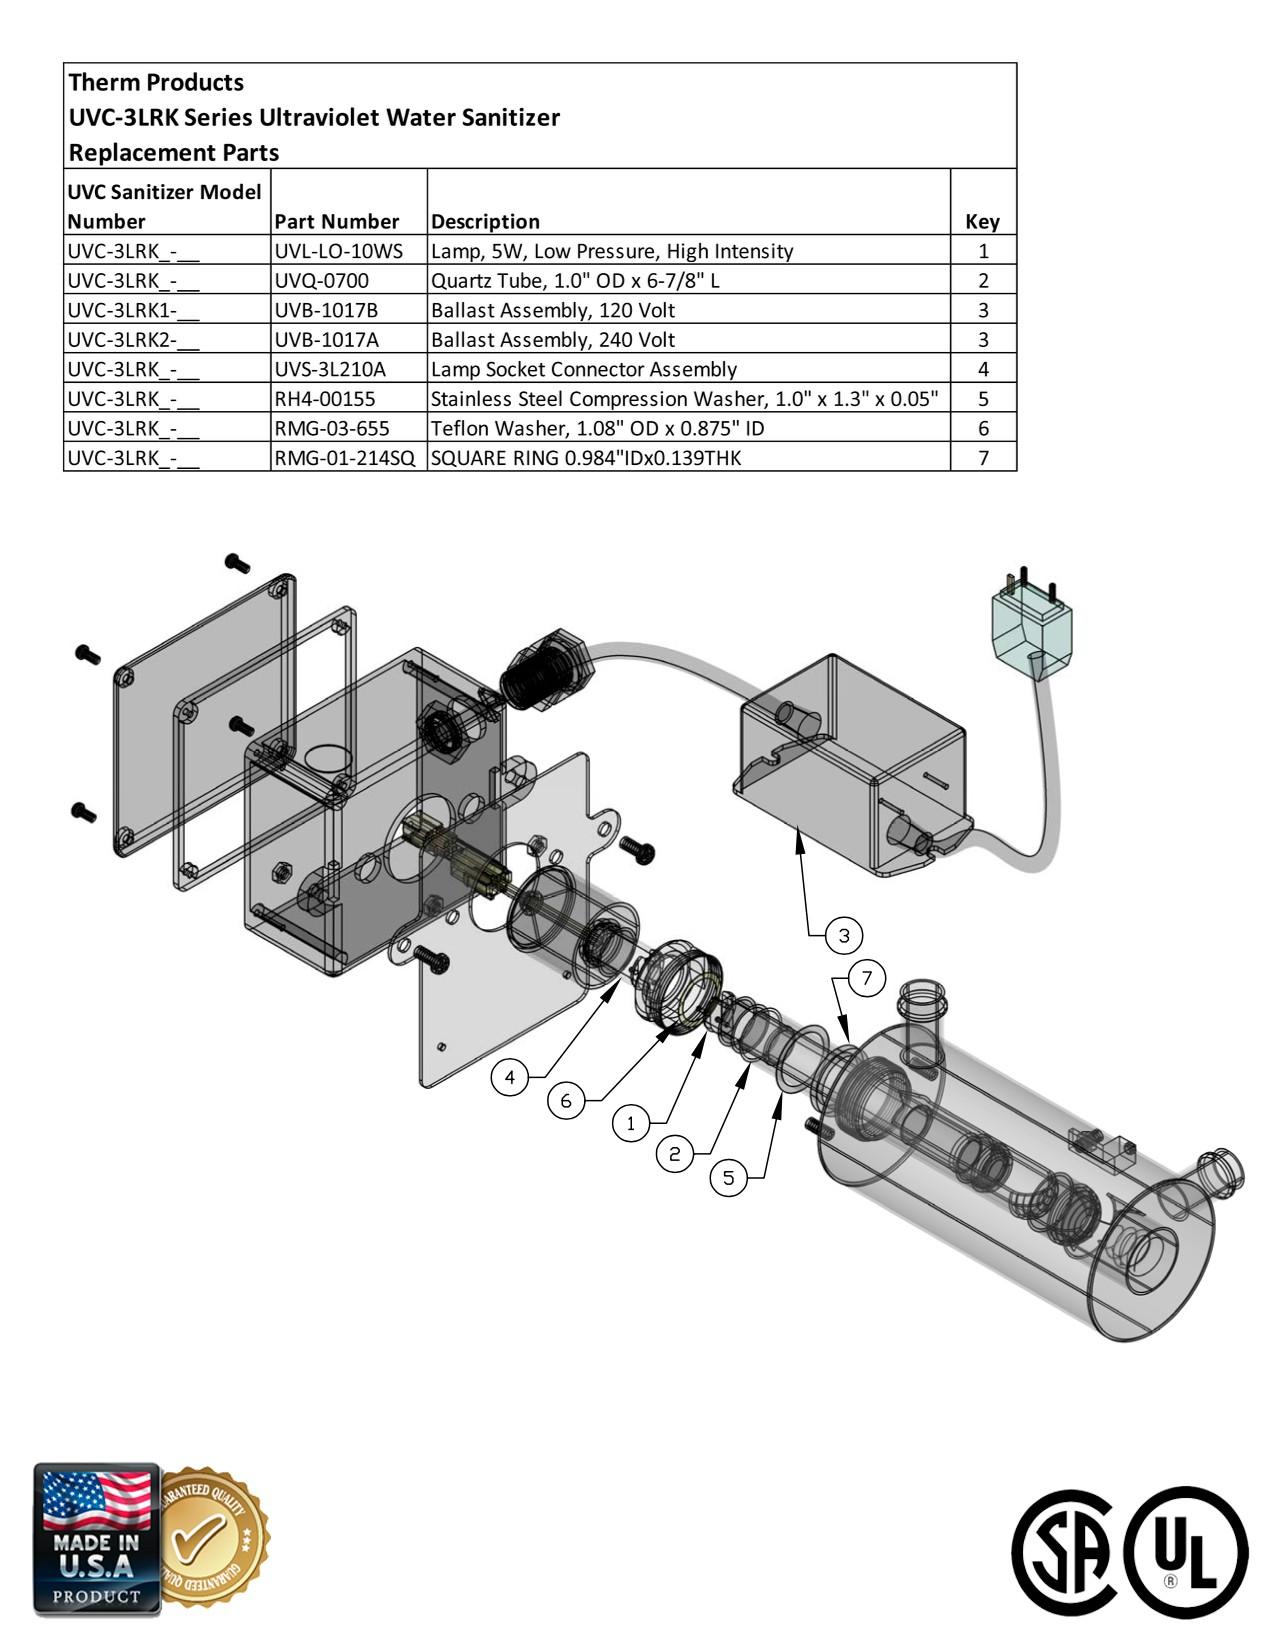 hot tub wiring diagram likewise 240v gfci breaker wiring diagram on